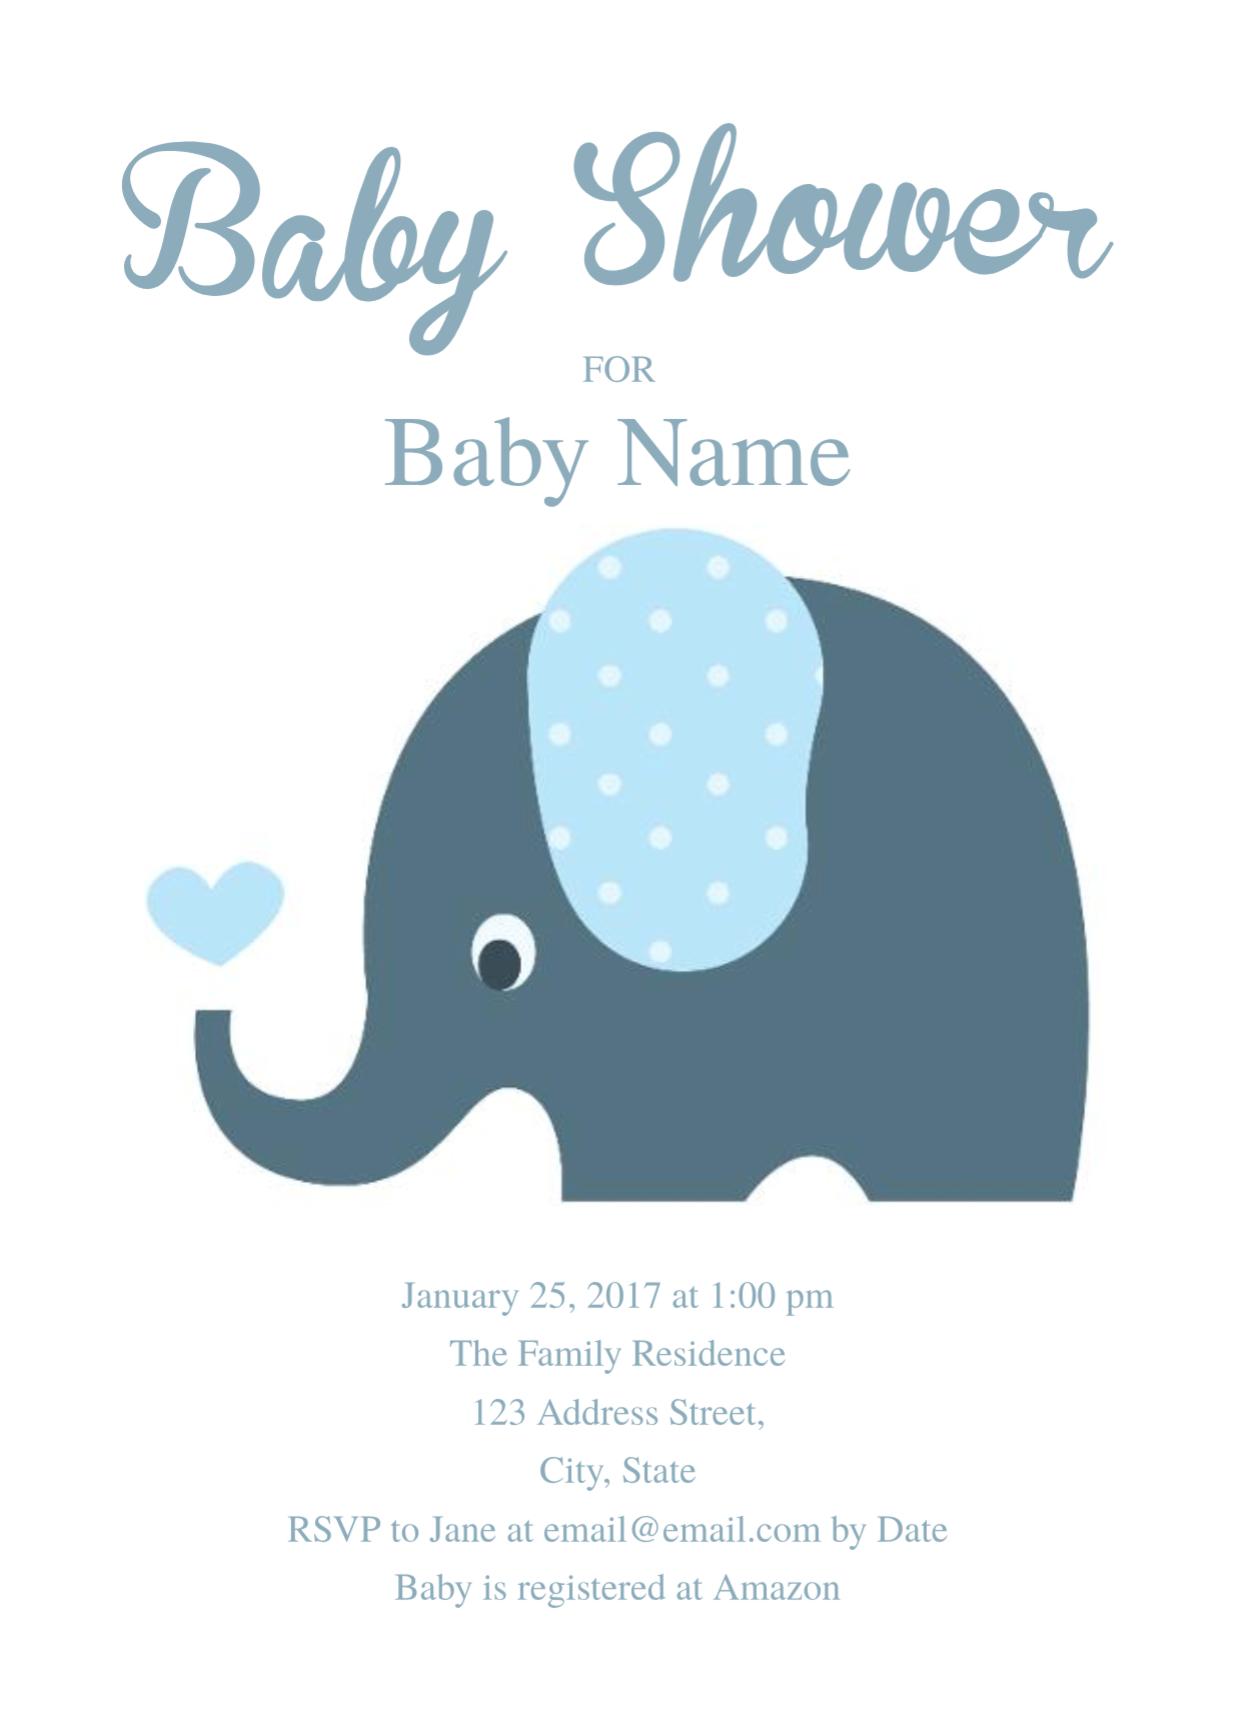 Cute Elephant Baby Shower Invitation Template   Free Invitation - Free Printable Baby Shower Cards Templates